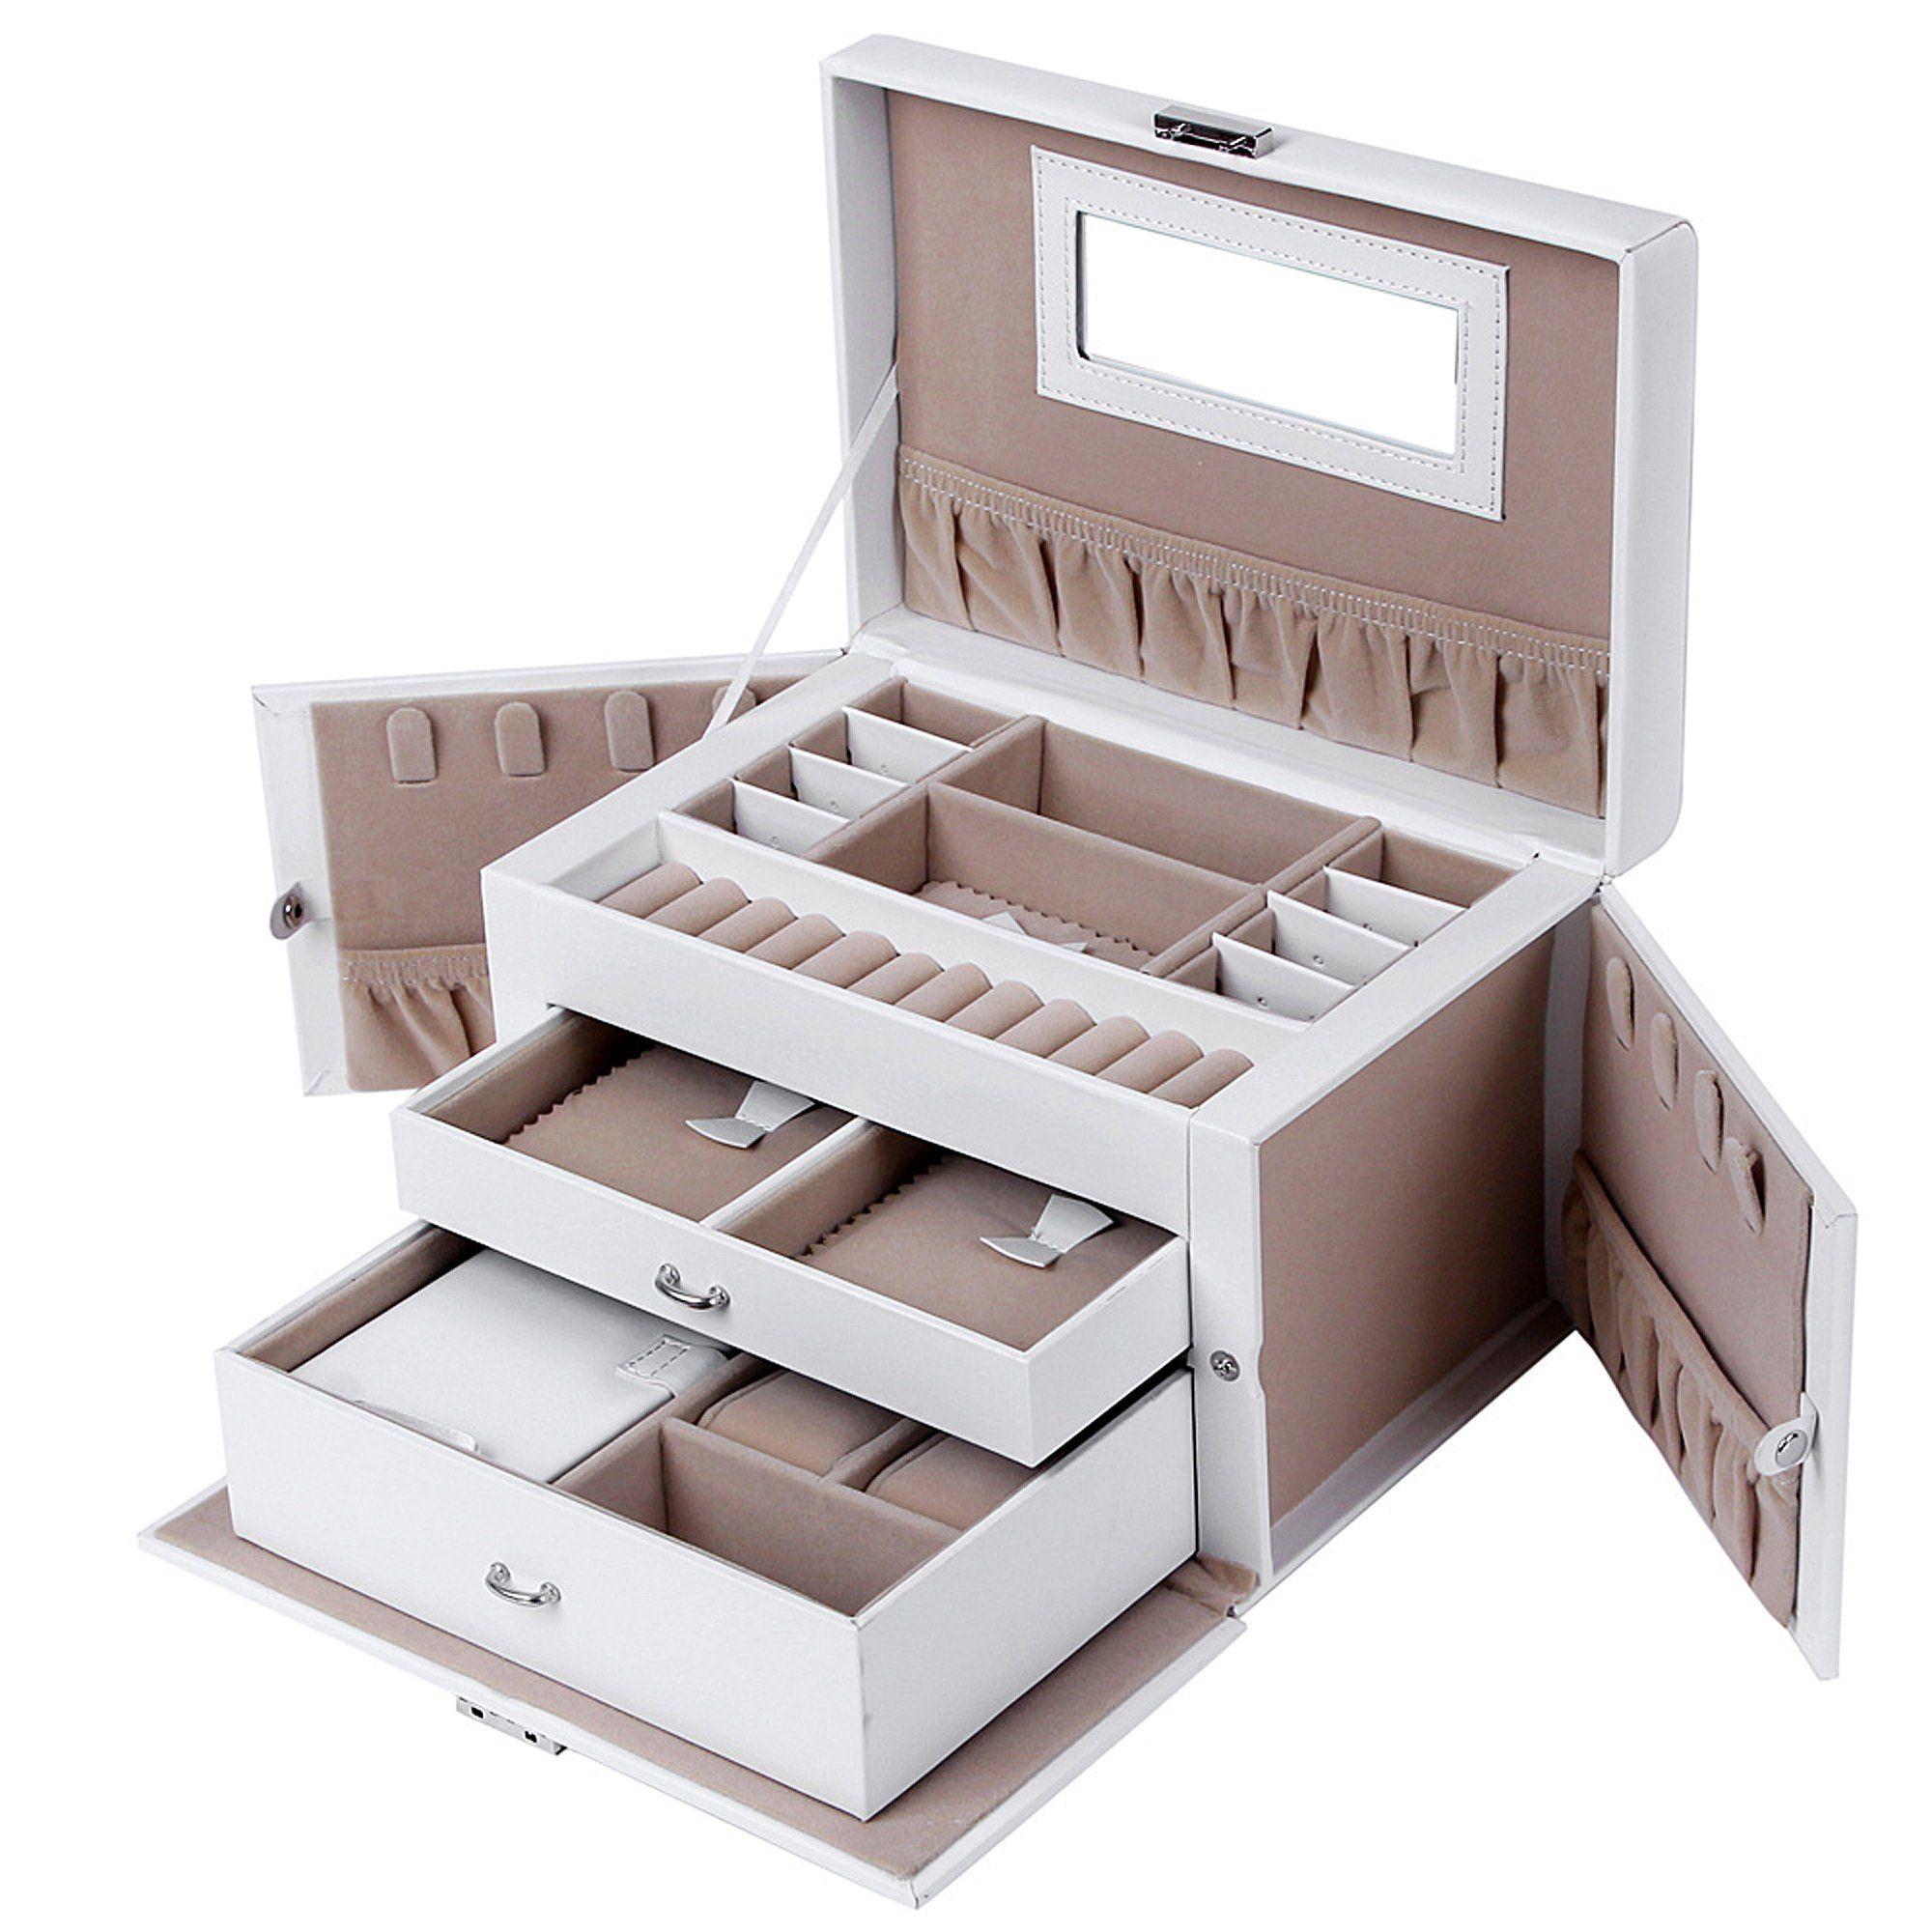 songmics caja joyero joyas aretes dijes anillo de la pulsera joyer a caja de almacenamiento de. Black Bedroom Furniture Sets. Home Design Ideas